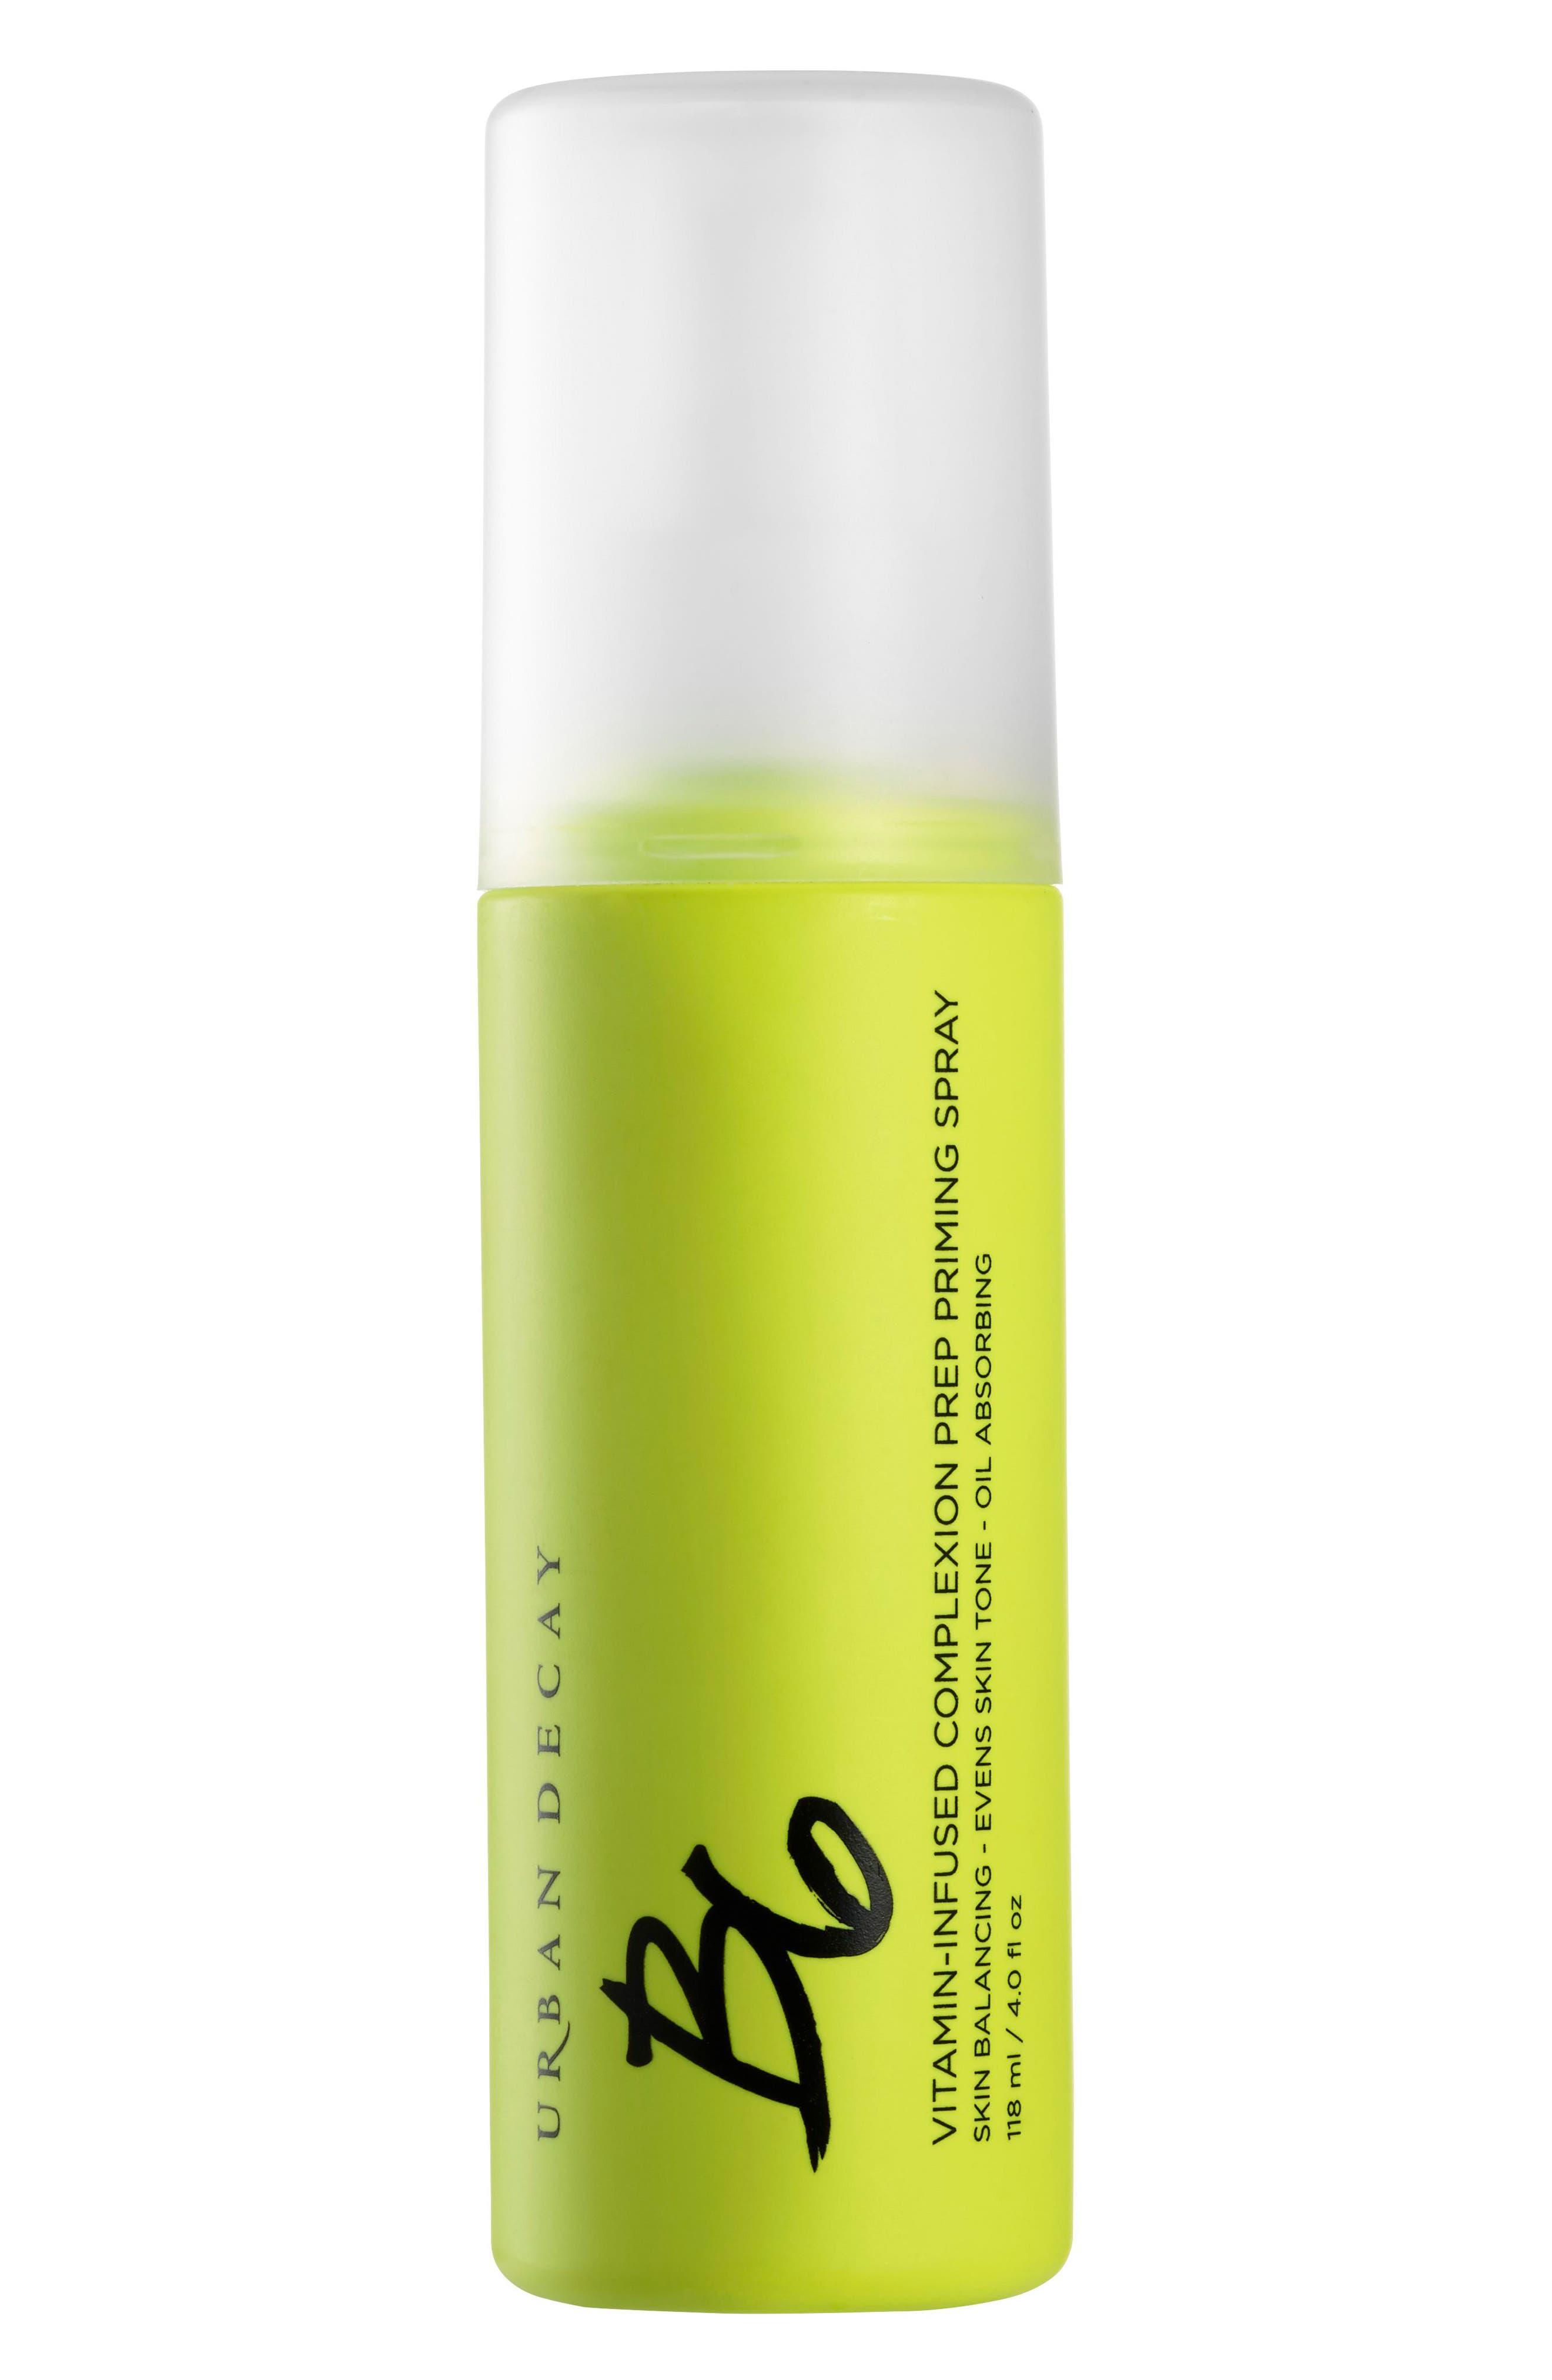 B6 Vitamin-Infused Complexion Prep Priming Spray,                             Main thumbnail 1, color,                             NO COLOR